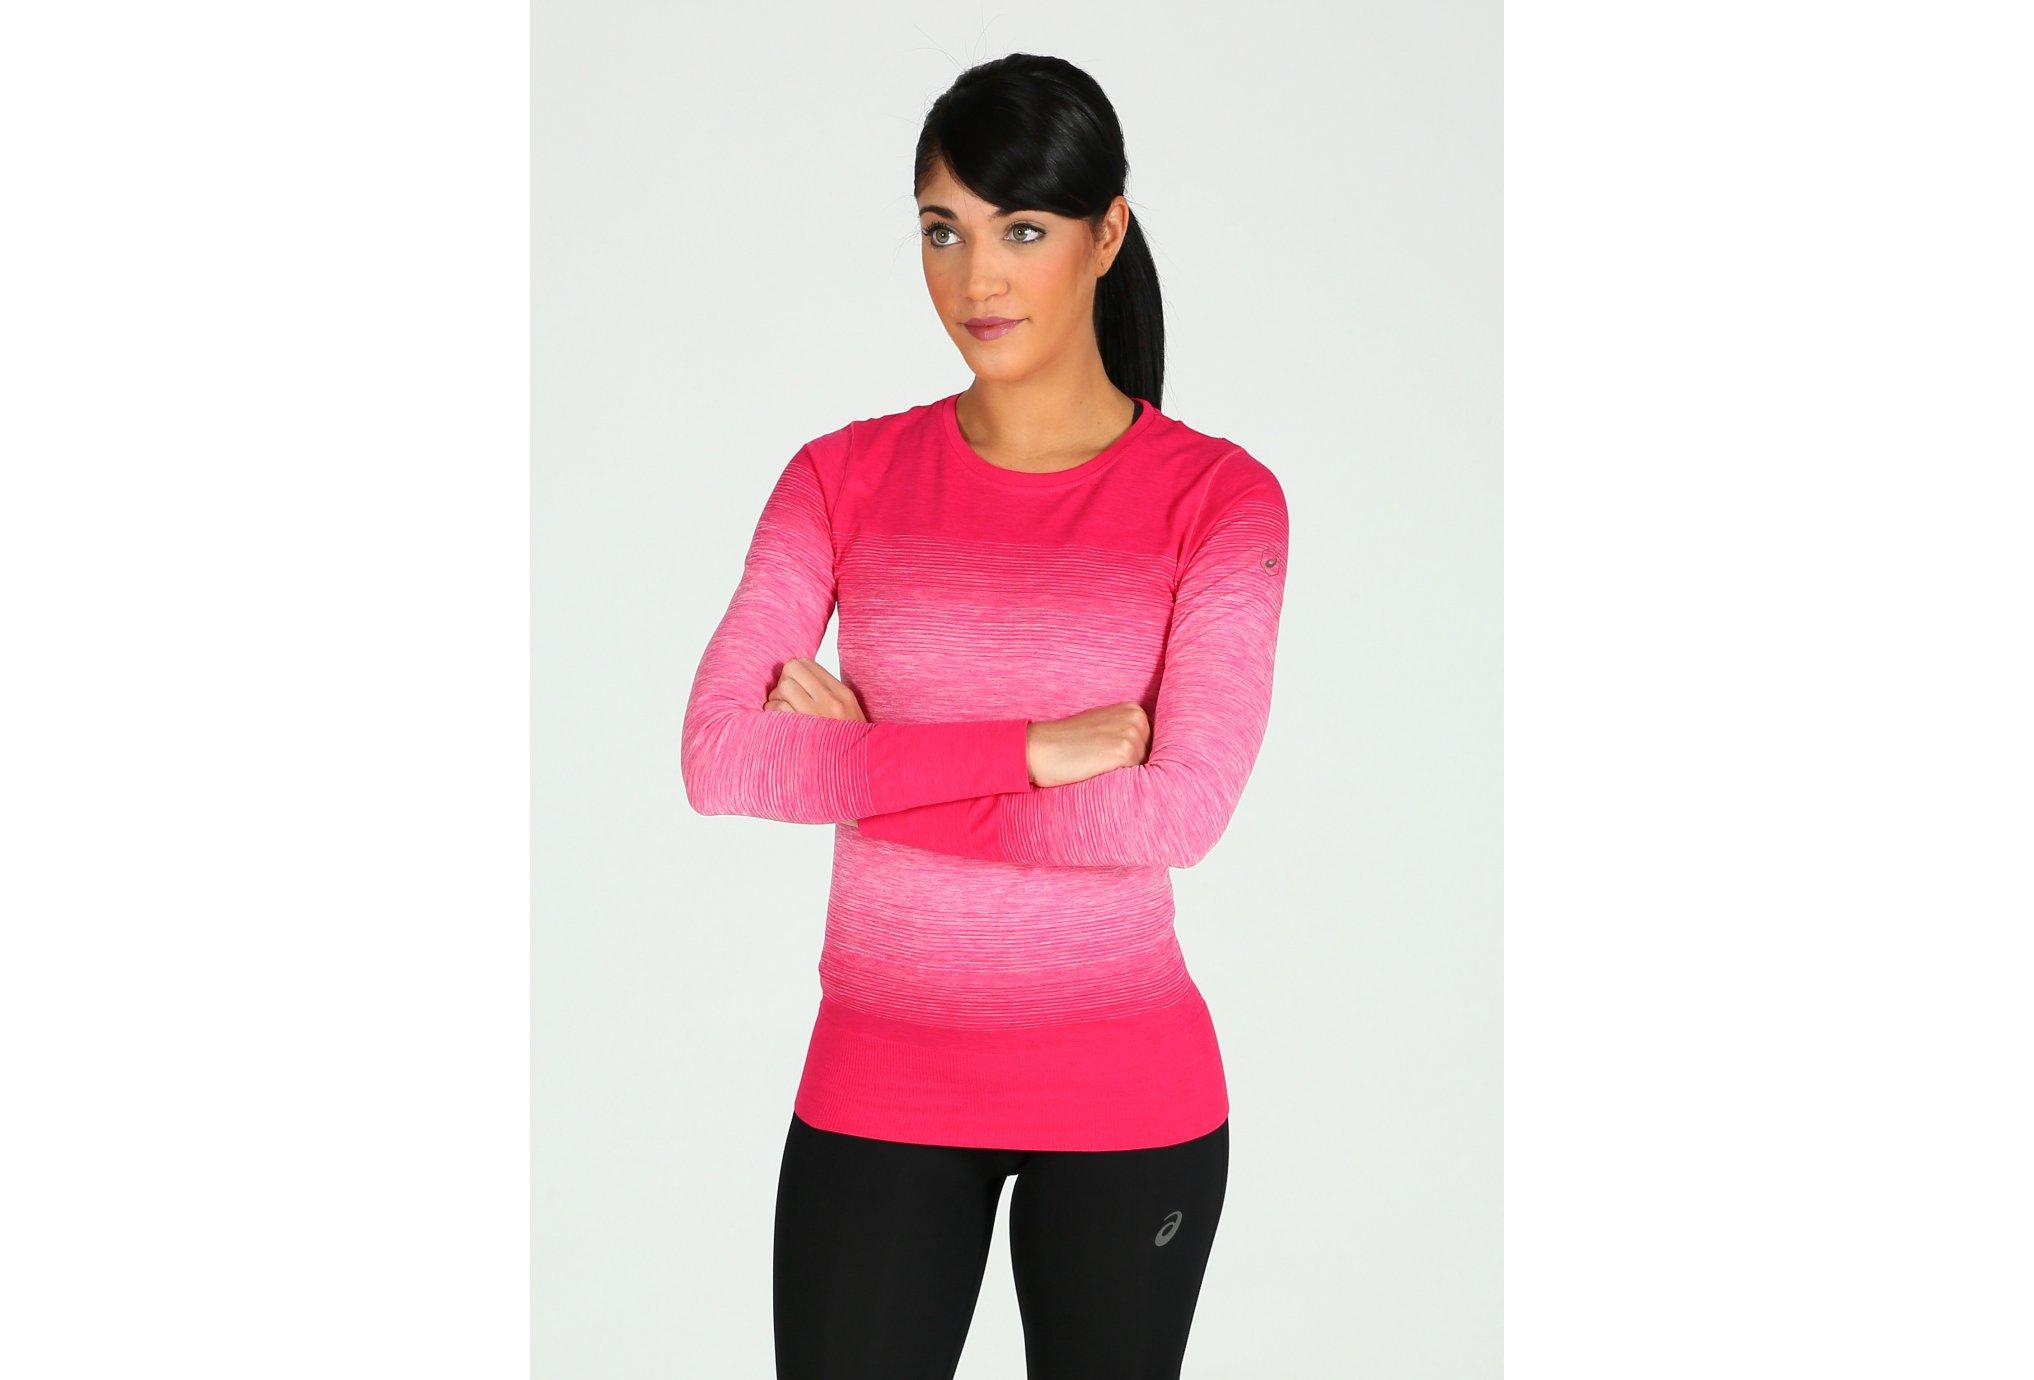 Asics FuzeX Seamless LS W Diététique Vêtements femme